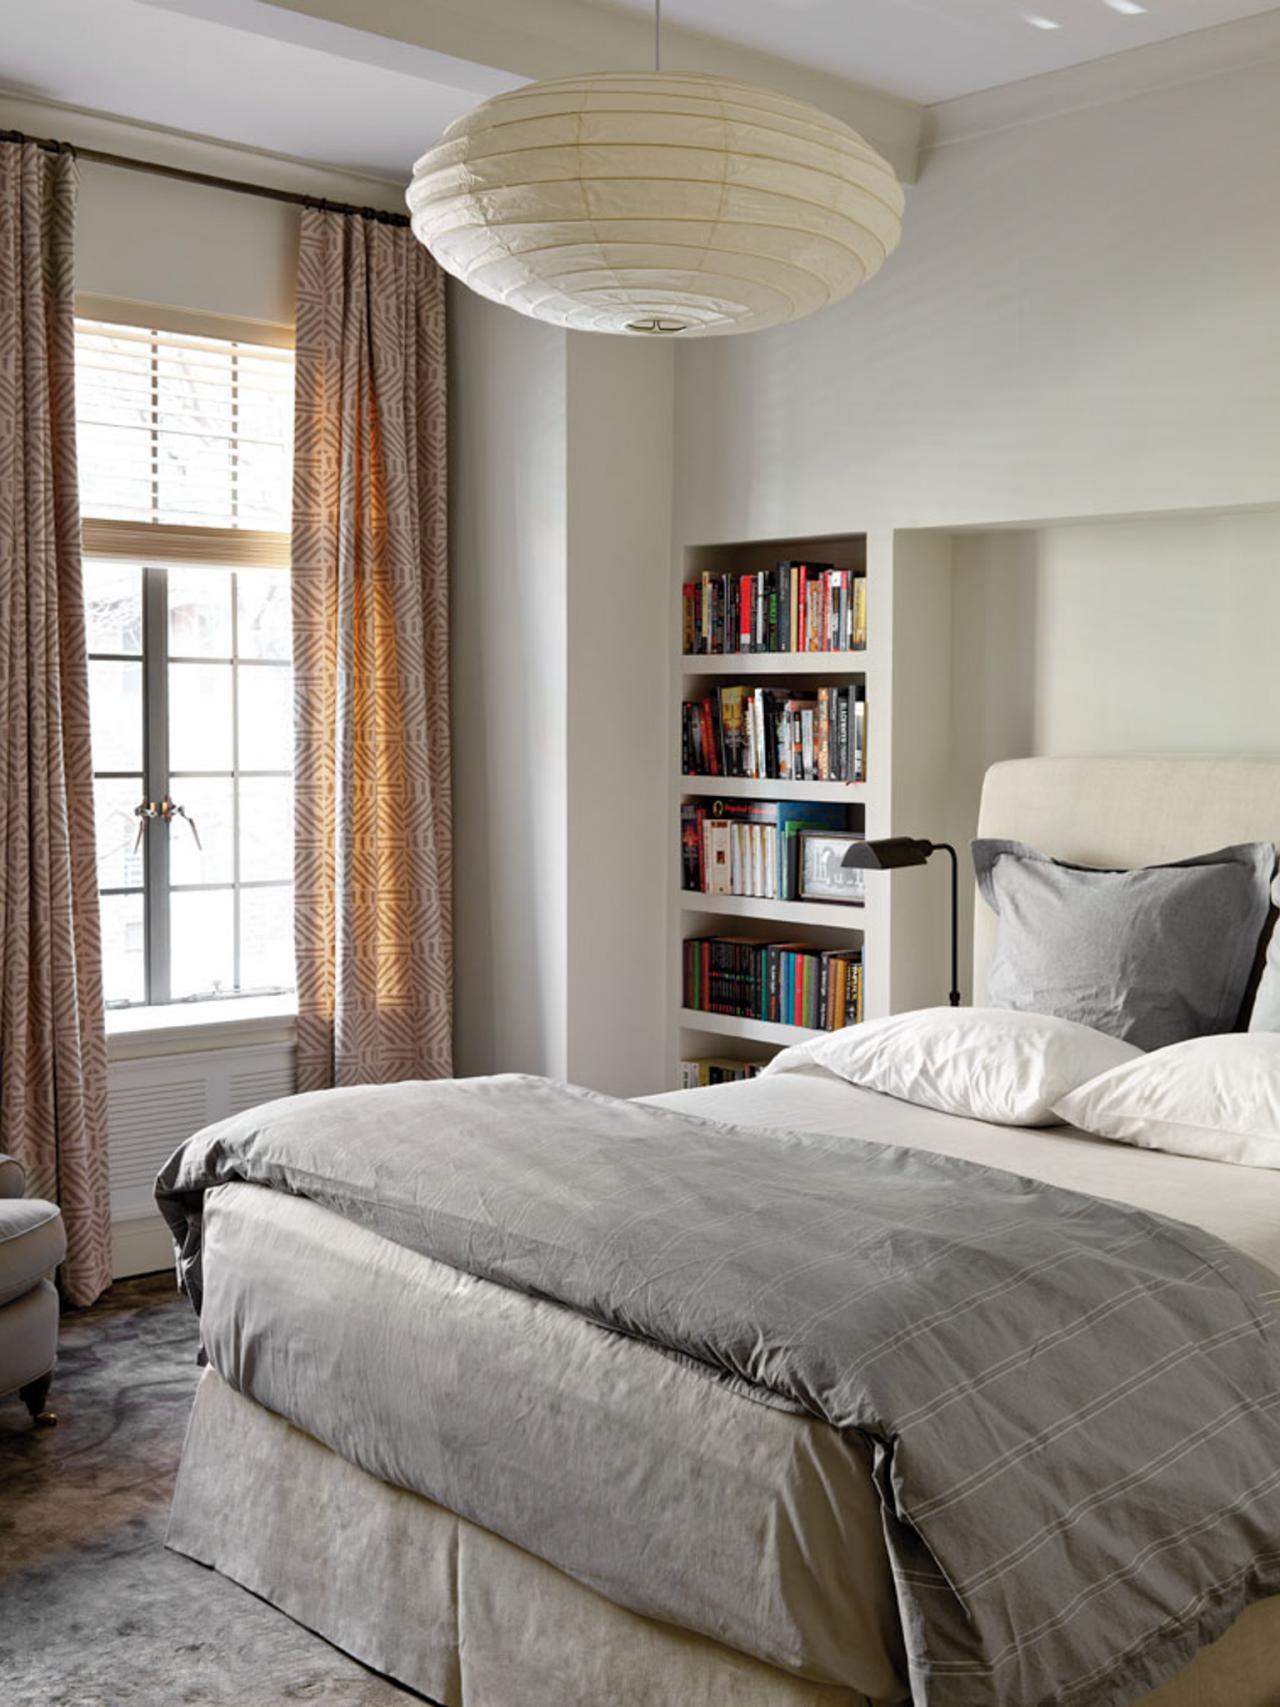 dp_design-udvikling-hvid-overgangsperiode-bedroom_3x4-jpg-rend-hgtvcom-1280-1707